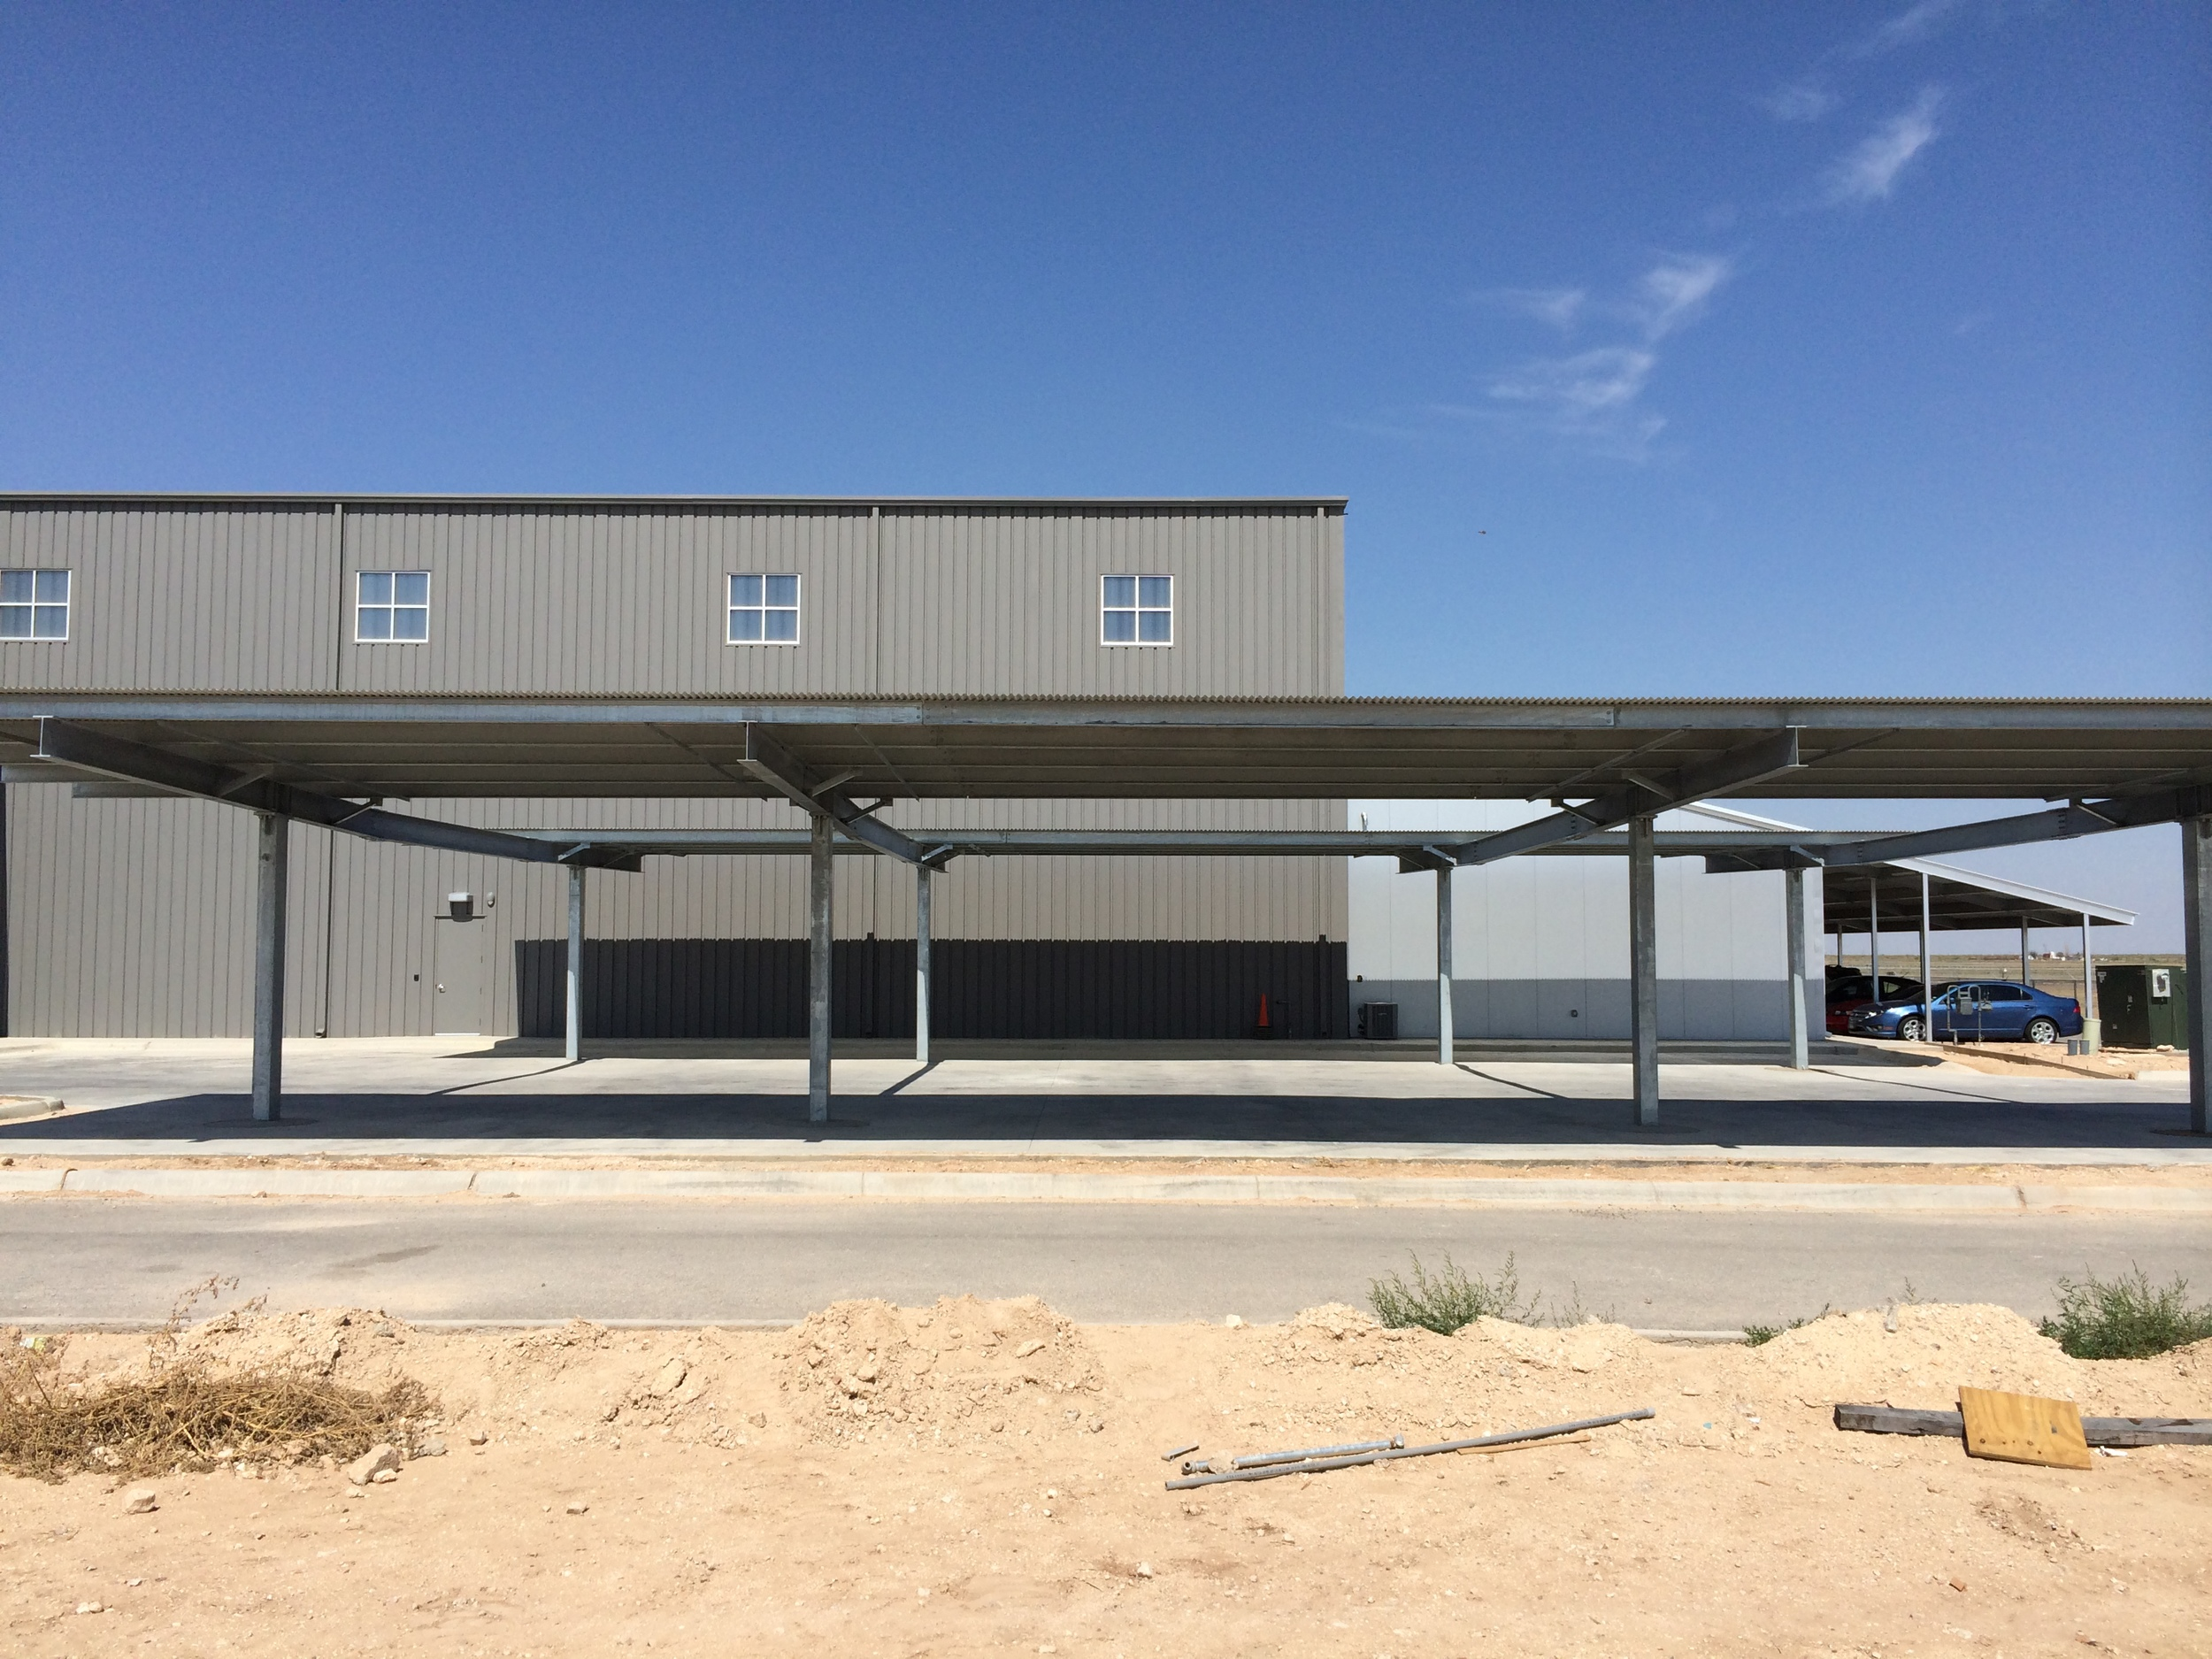 Carport Shade Structure 5JPG.JPG